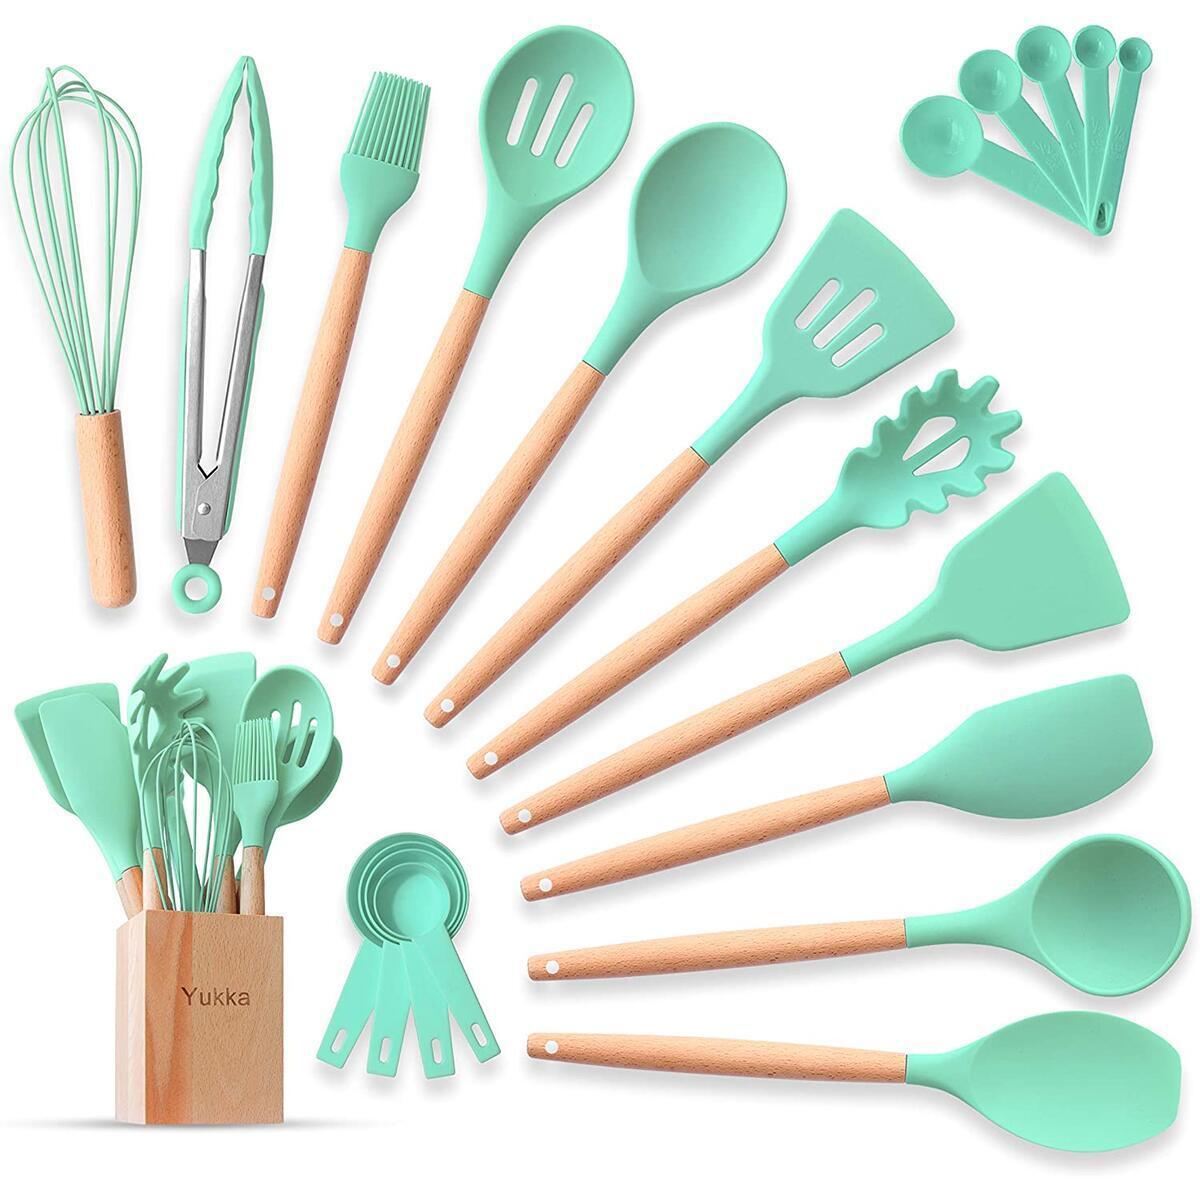 Silicone Kitchen Utensils Cooking Set 22pcs